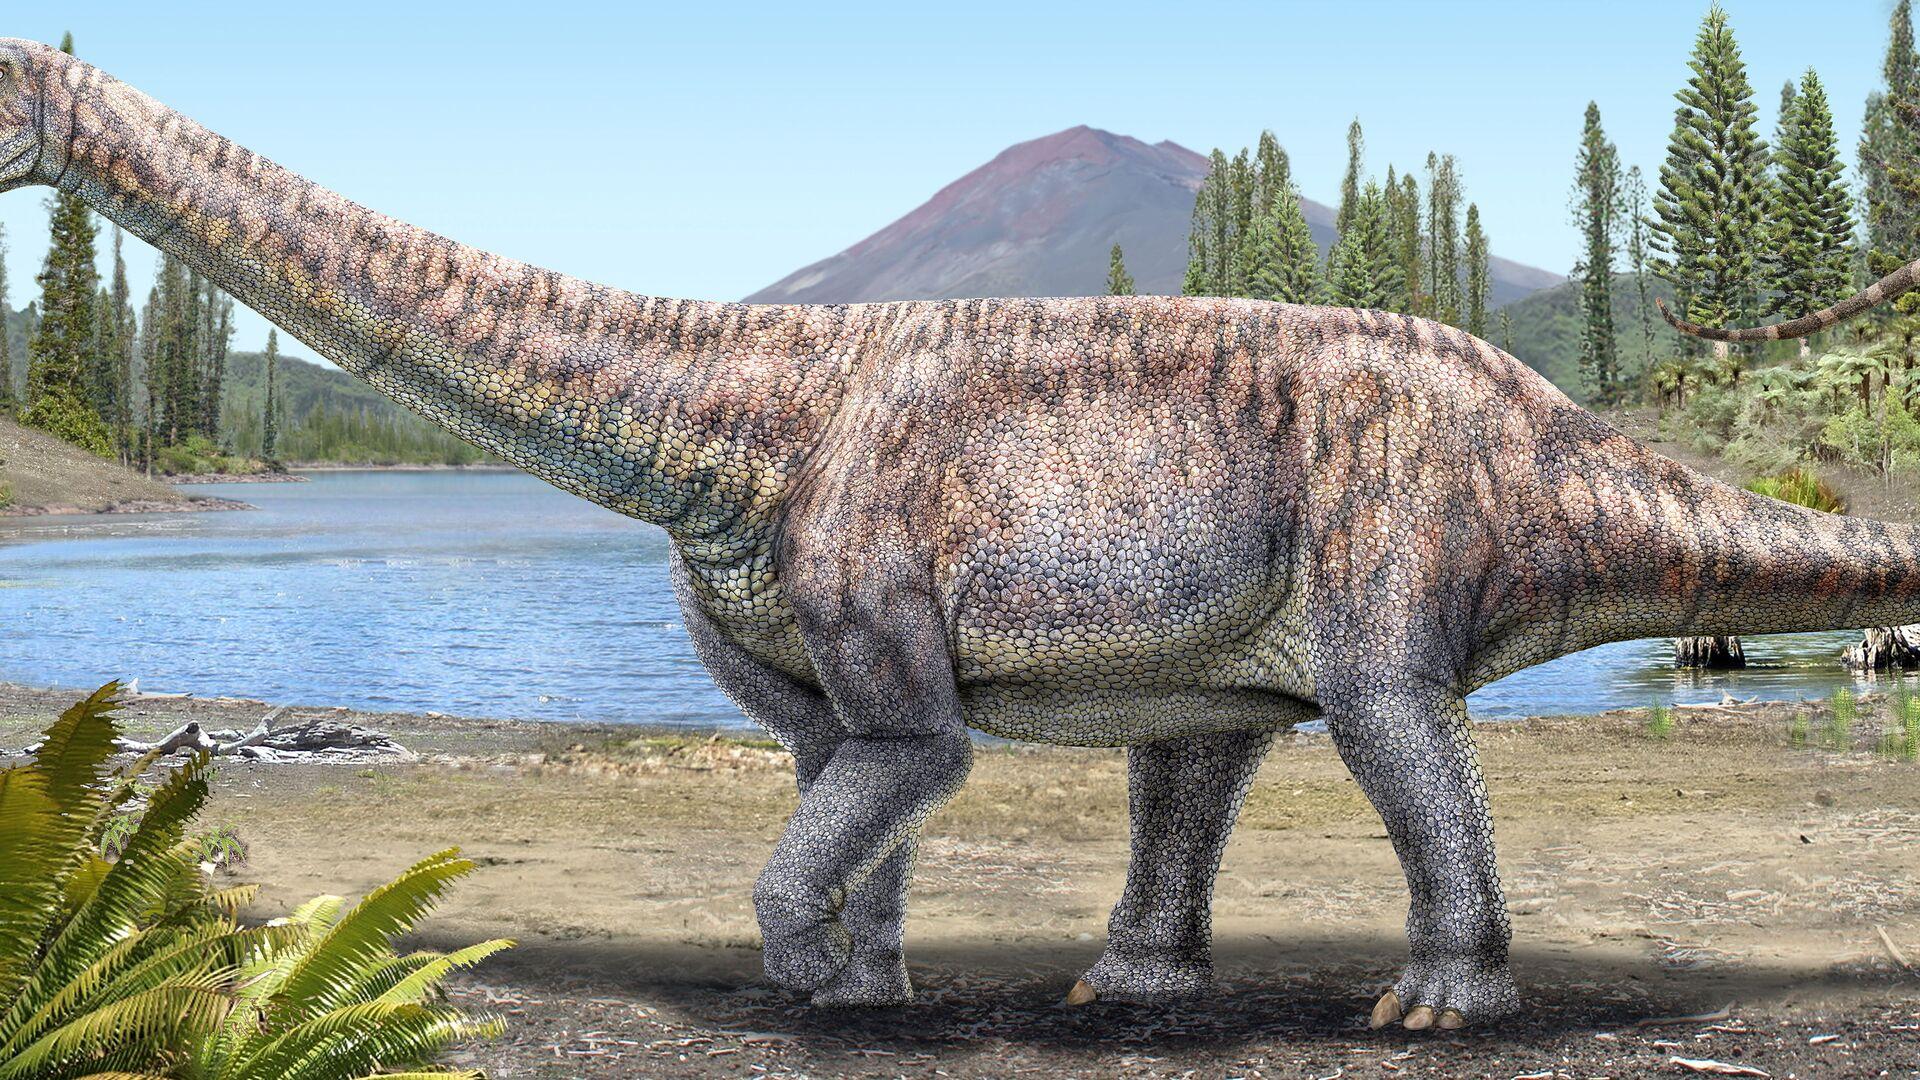 Dinosauro Arackar licanantay - Sputnik Italia, 1920, 09.07.2021